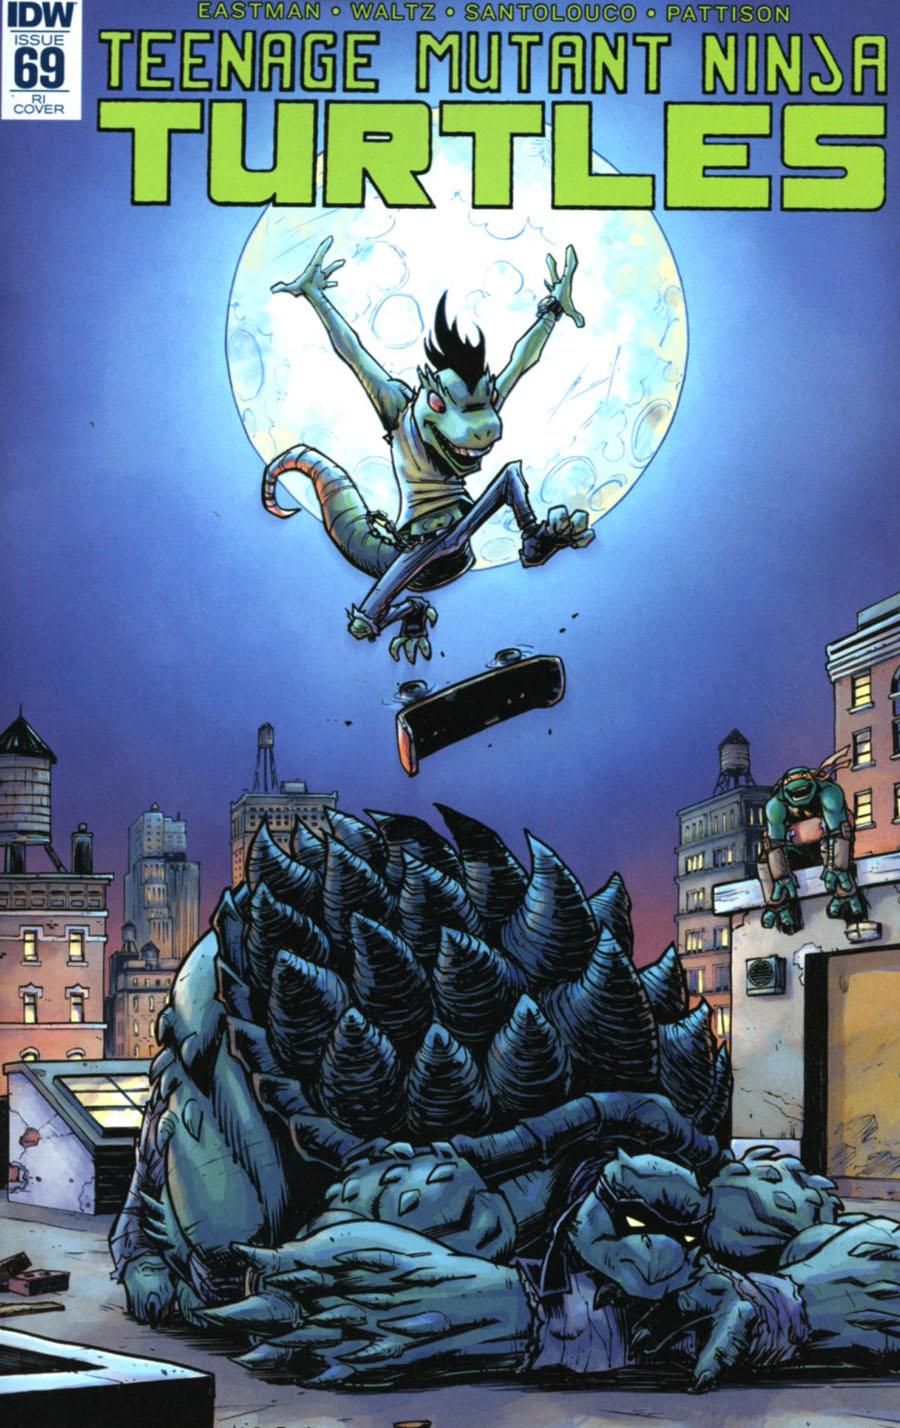 Teenage Mutant Ninja Turtles Vol 5 #69 Cover C Incentive Nick Roche Variant Cover